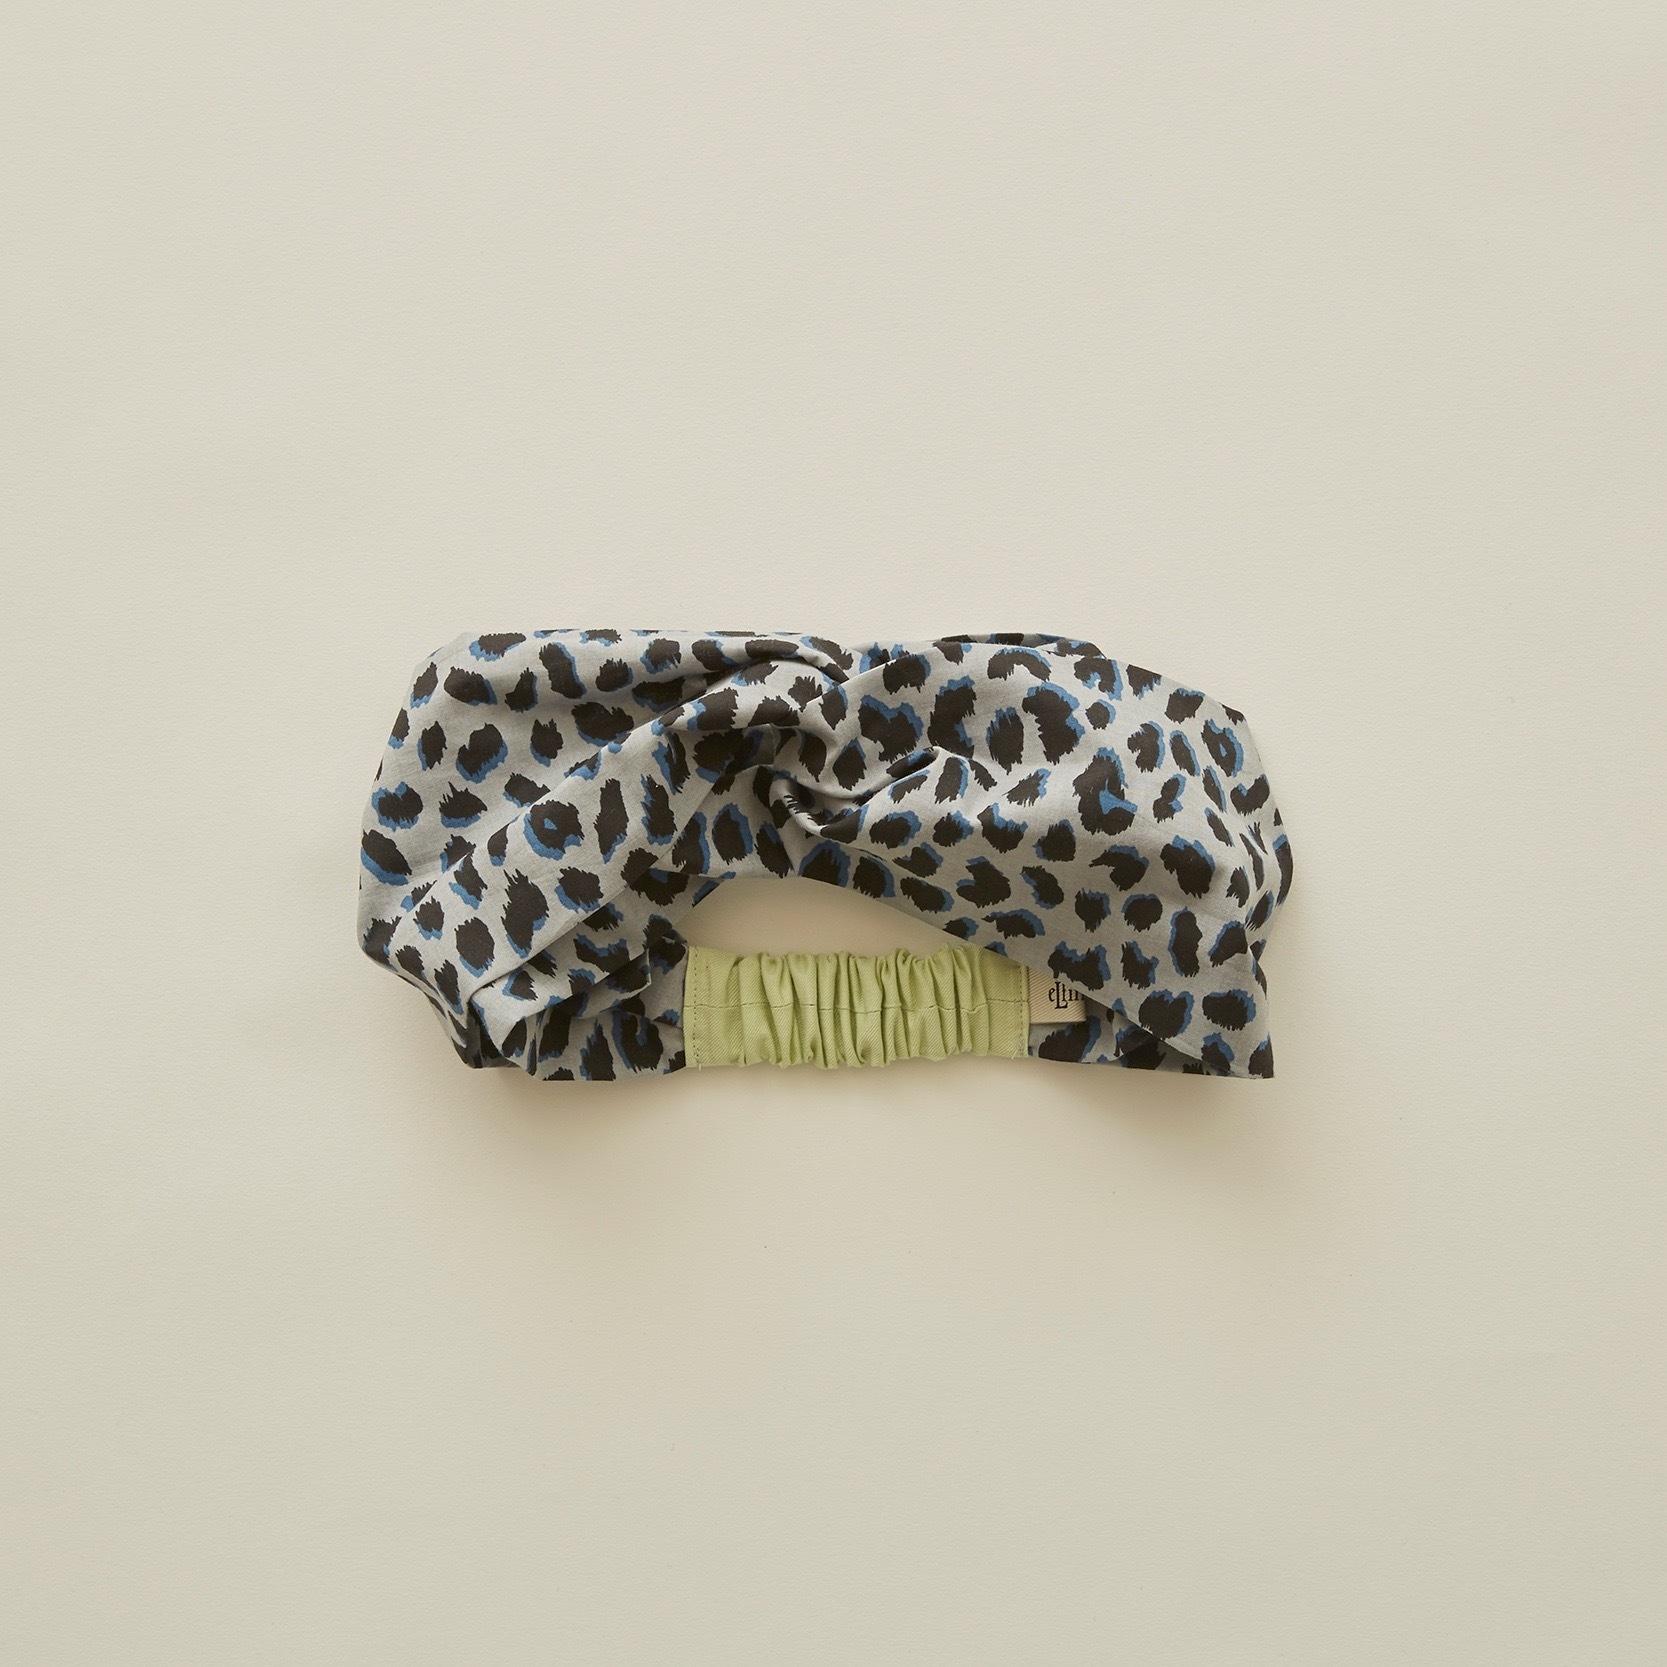 《eLfinFolk 2020SS》leopard turban / gray / 58cm